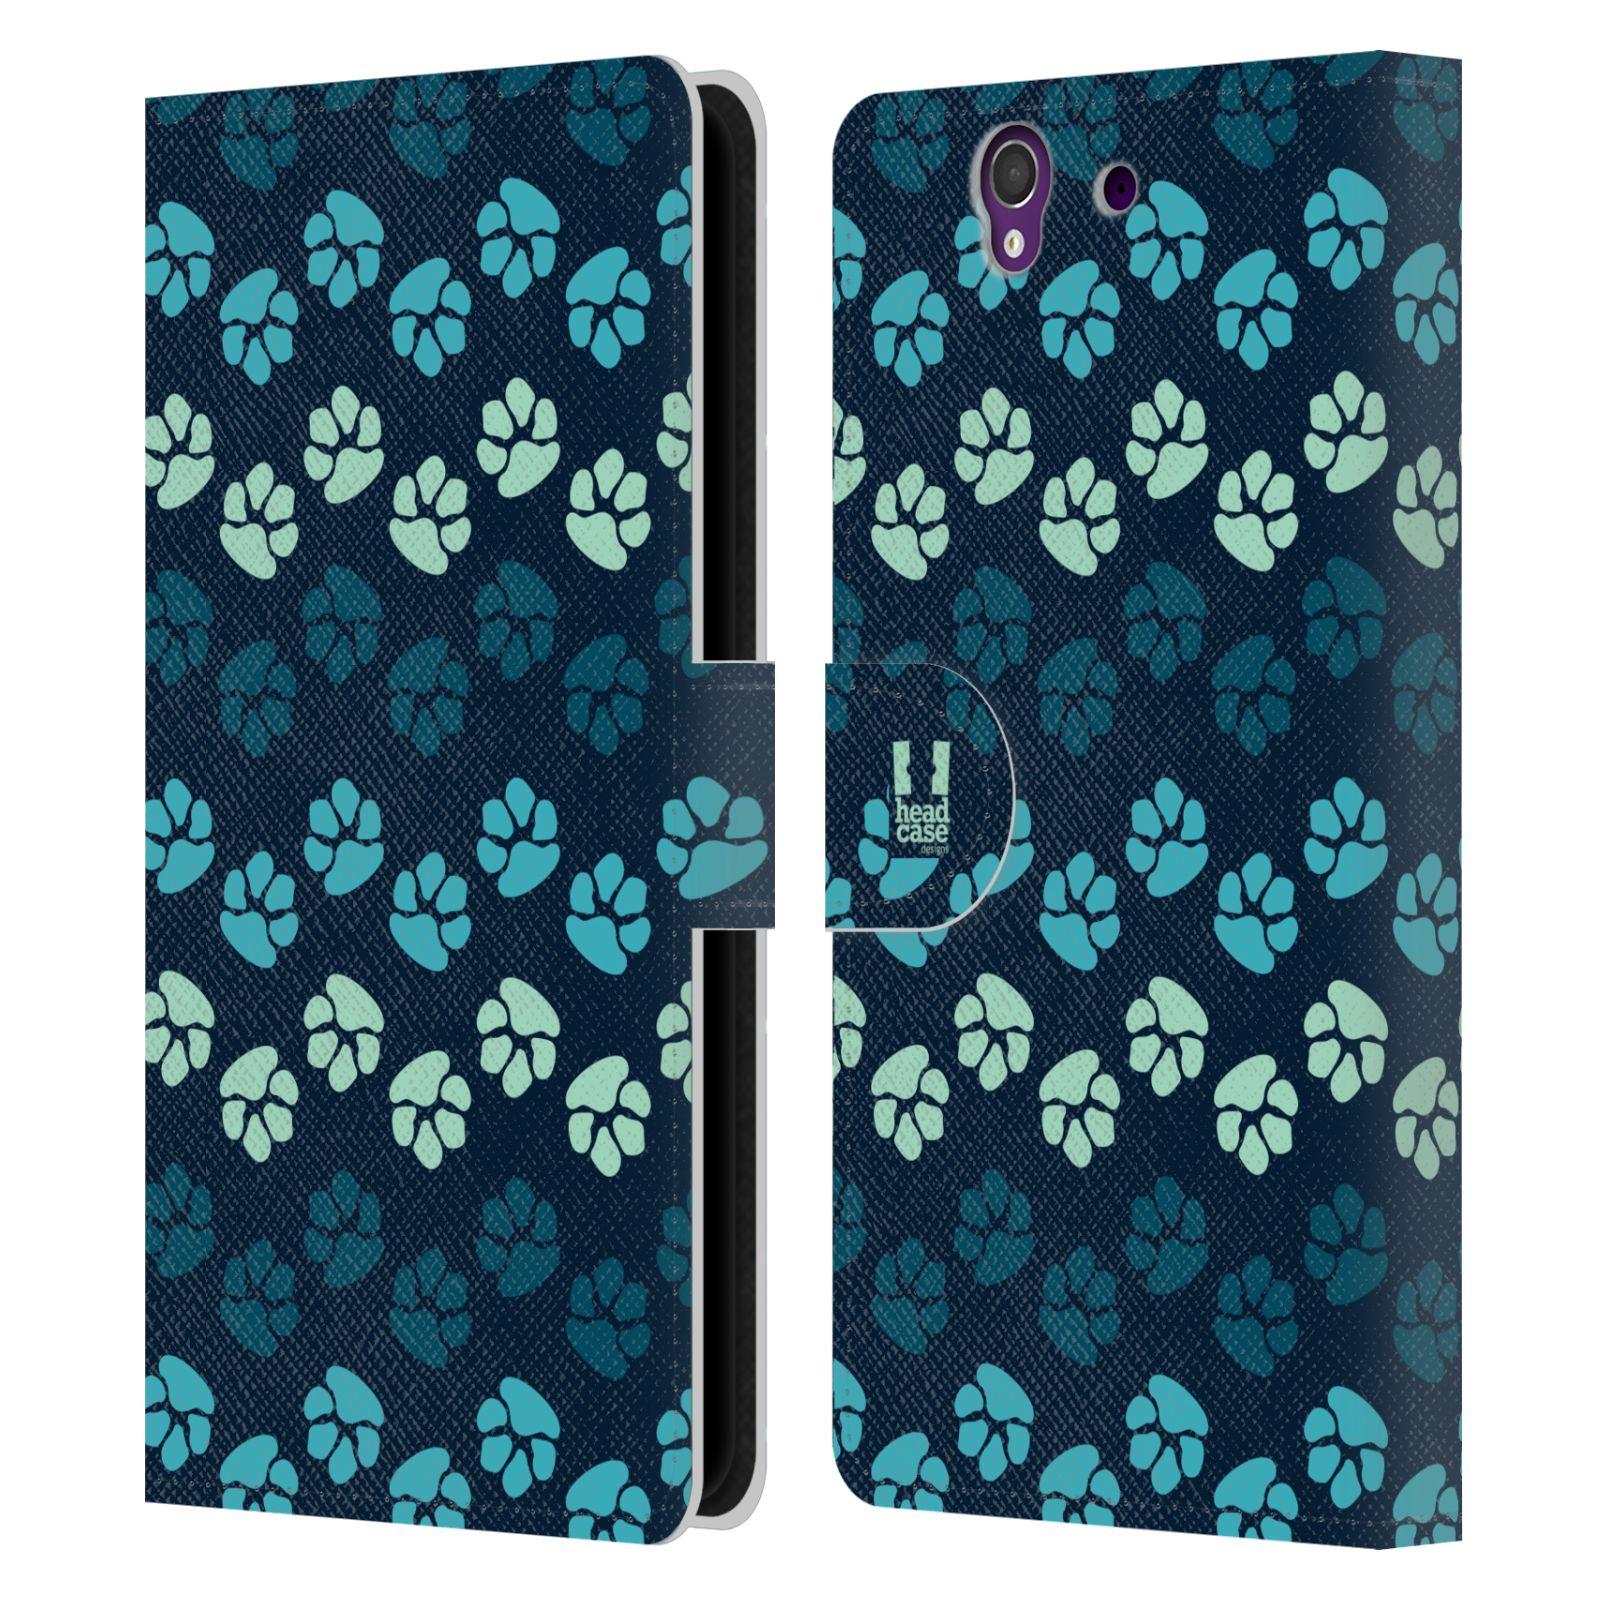 HEAD CASE Flipové pouzdro pro mobil SONY XPERIA Z (C6603) Pejsek ťapky modrá barva